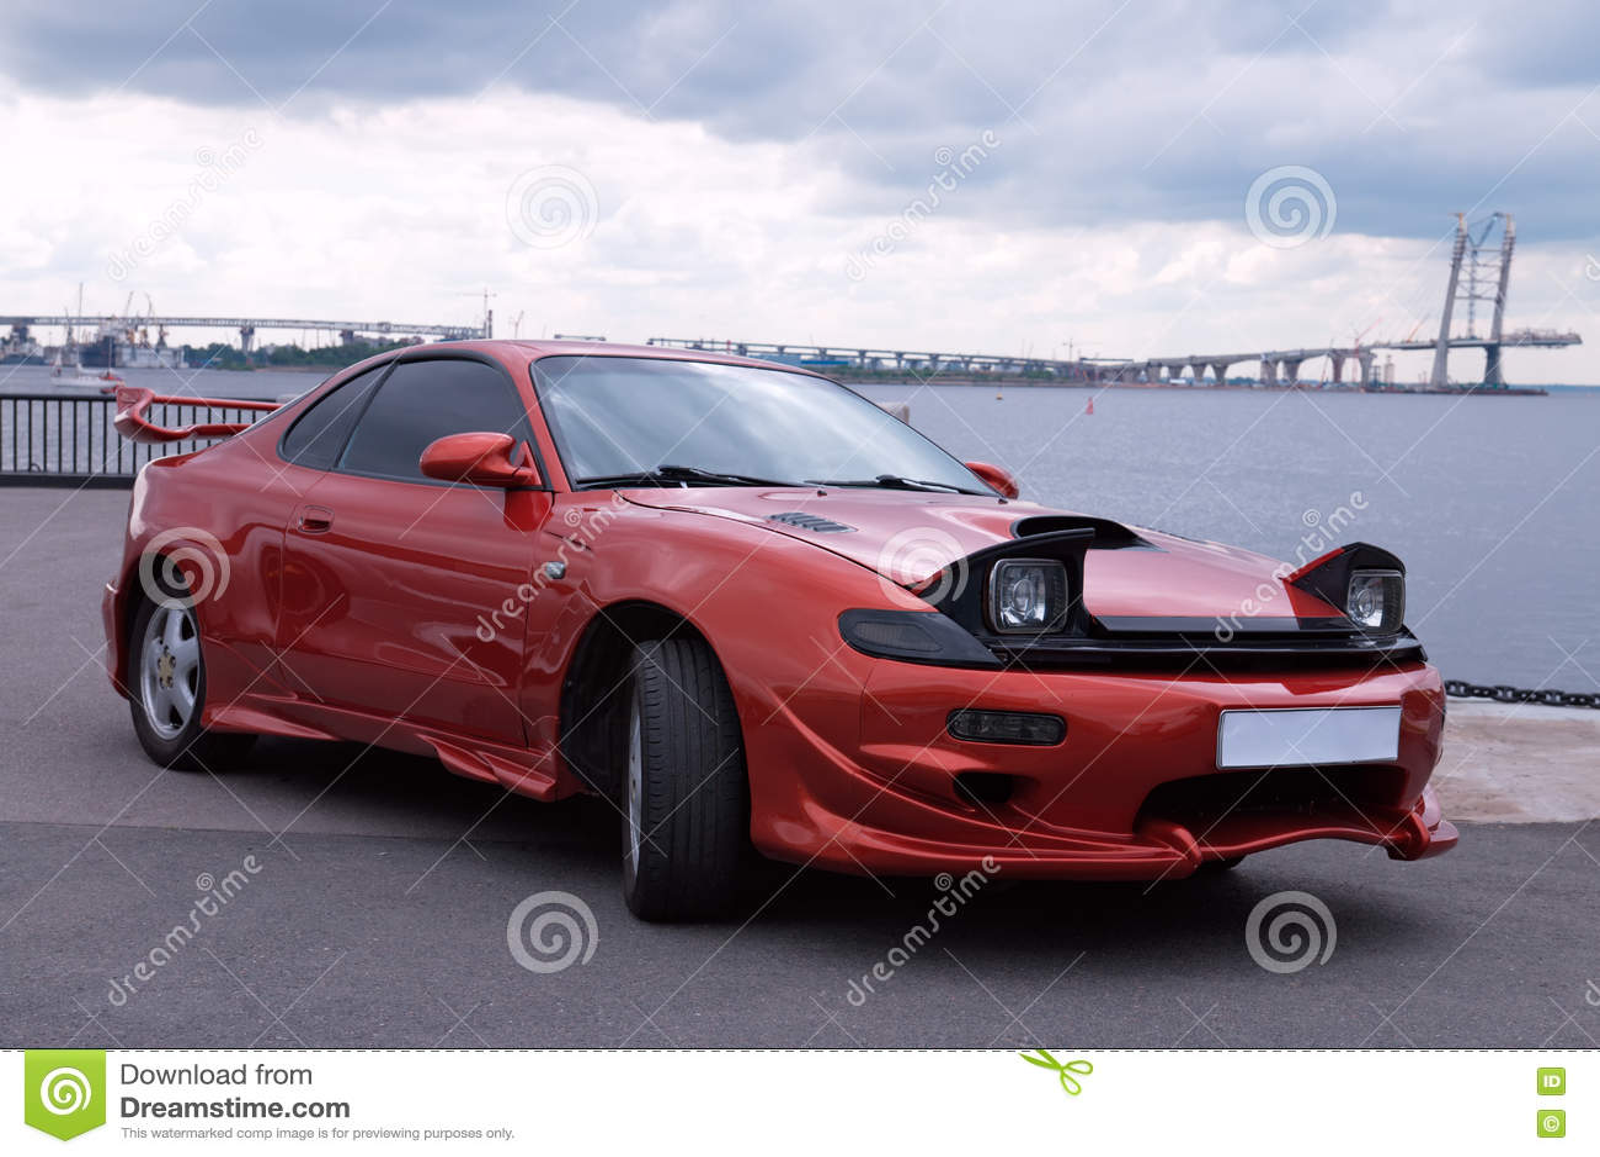 hight resolution of sankt petrsburg automotive show autophoto toyota celica